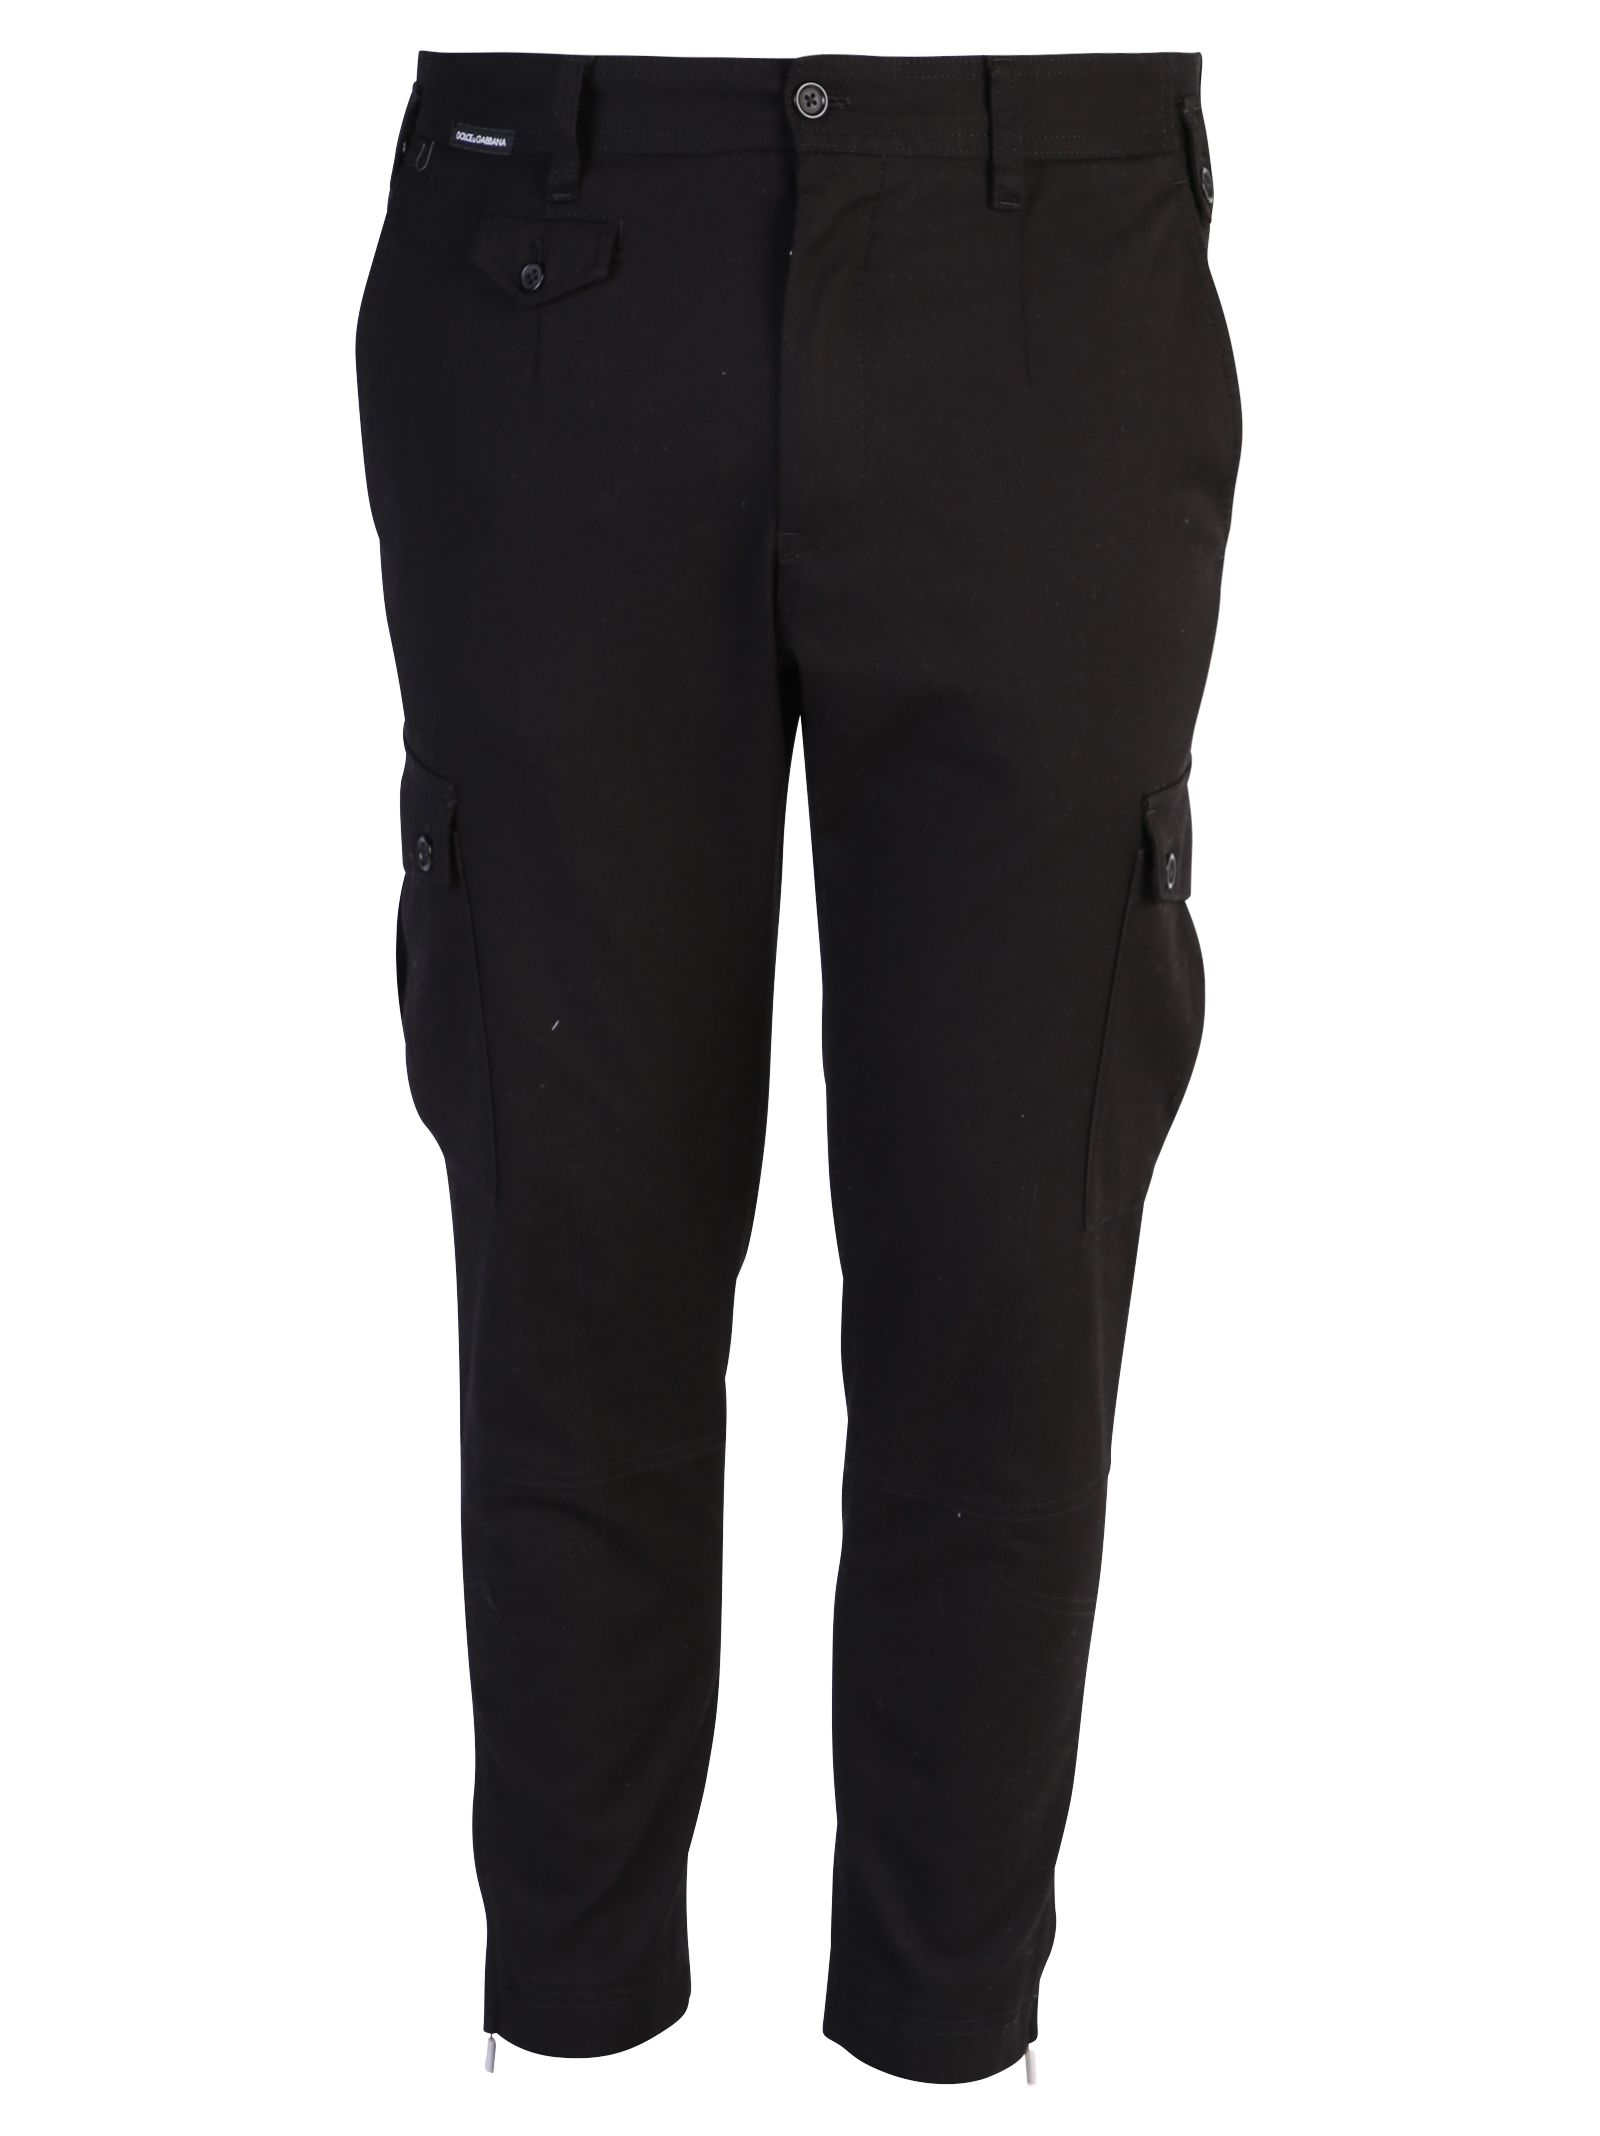 Dolce & Gabbana Multi-pockets Trousers